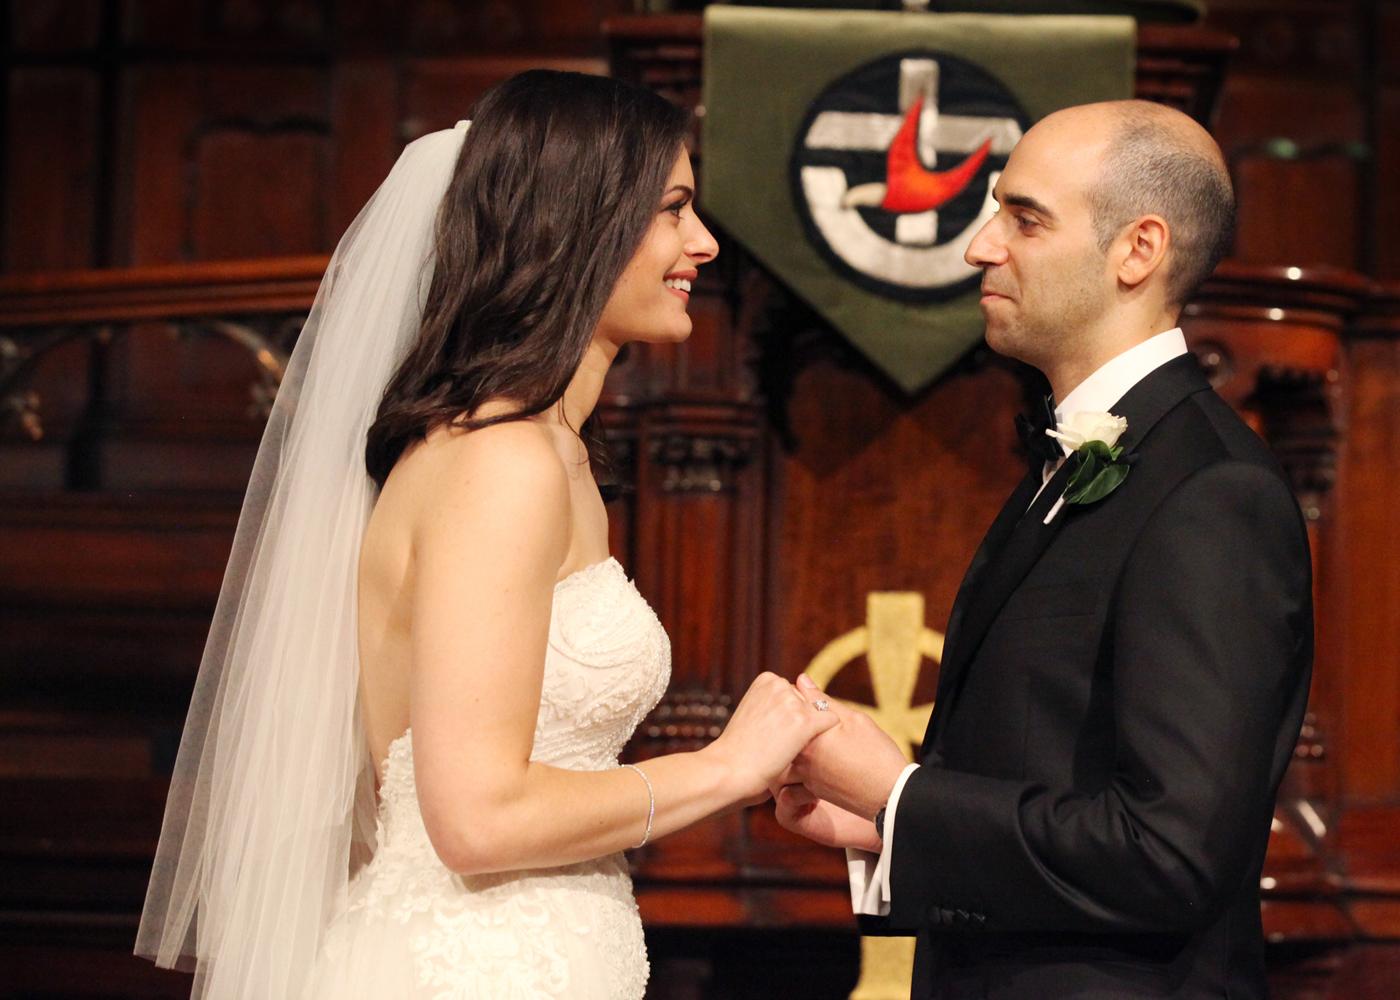 Melissa + Michael RC real bride sottero and midgley hadley wedding Dress